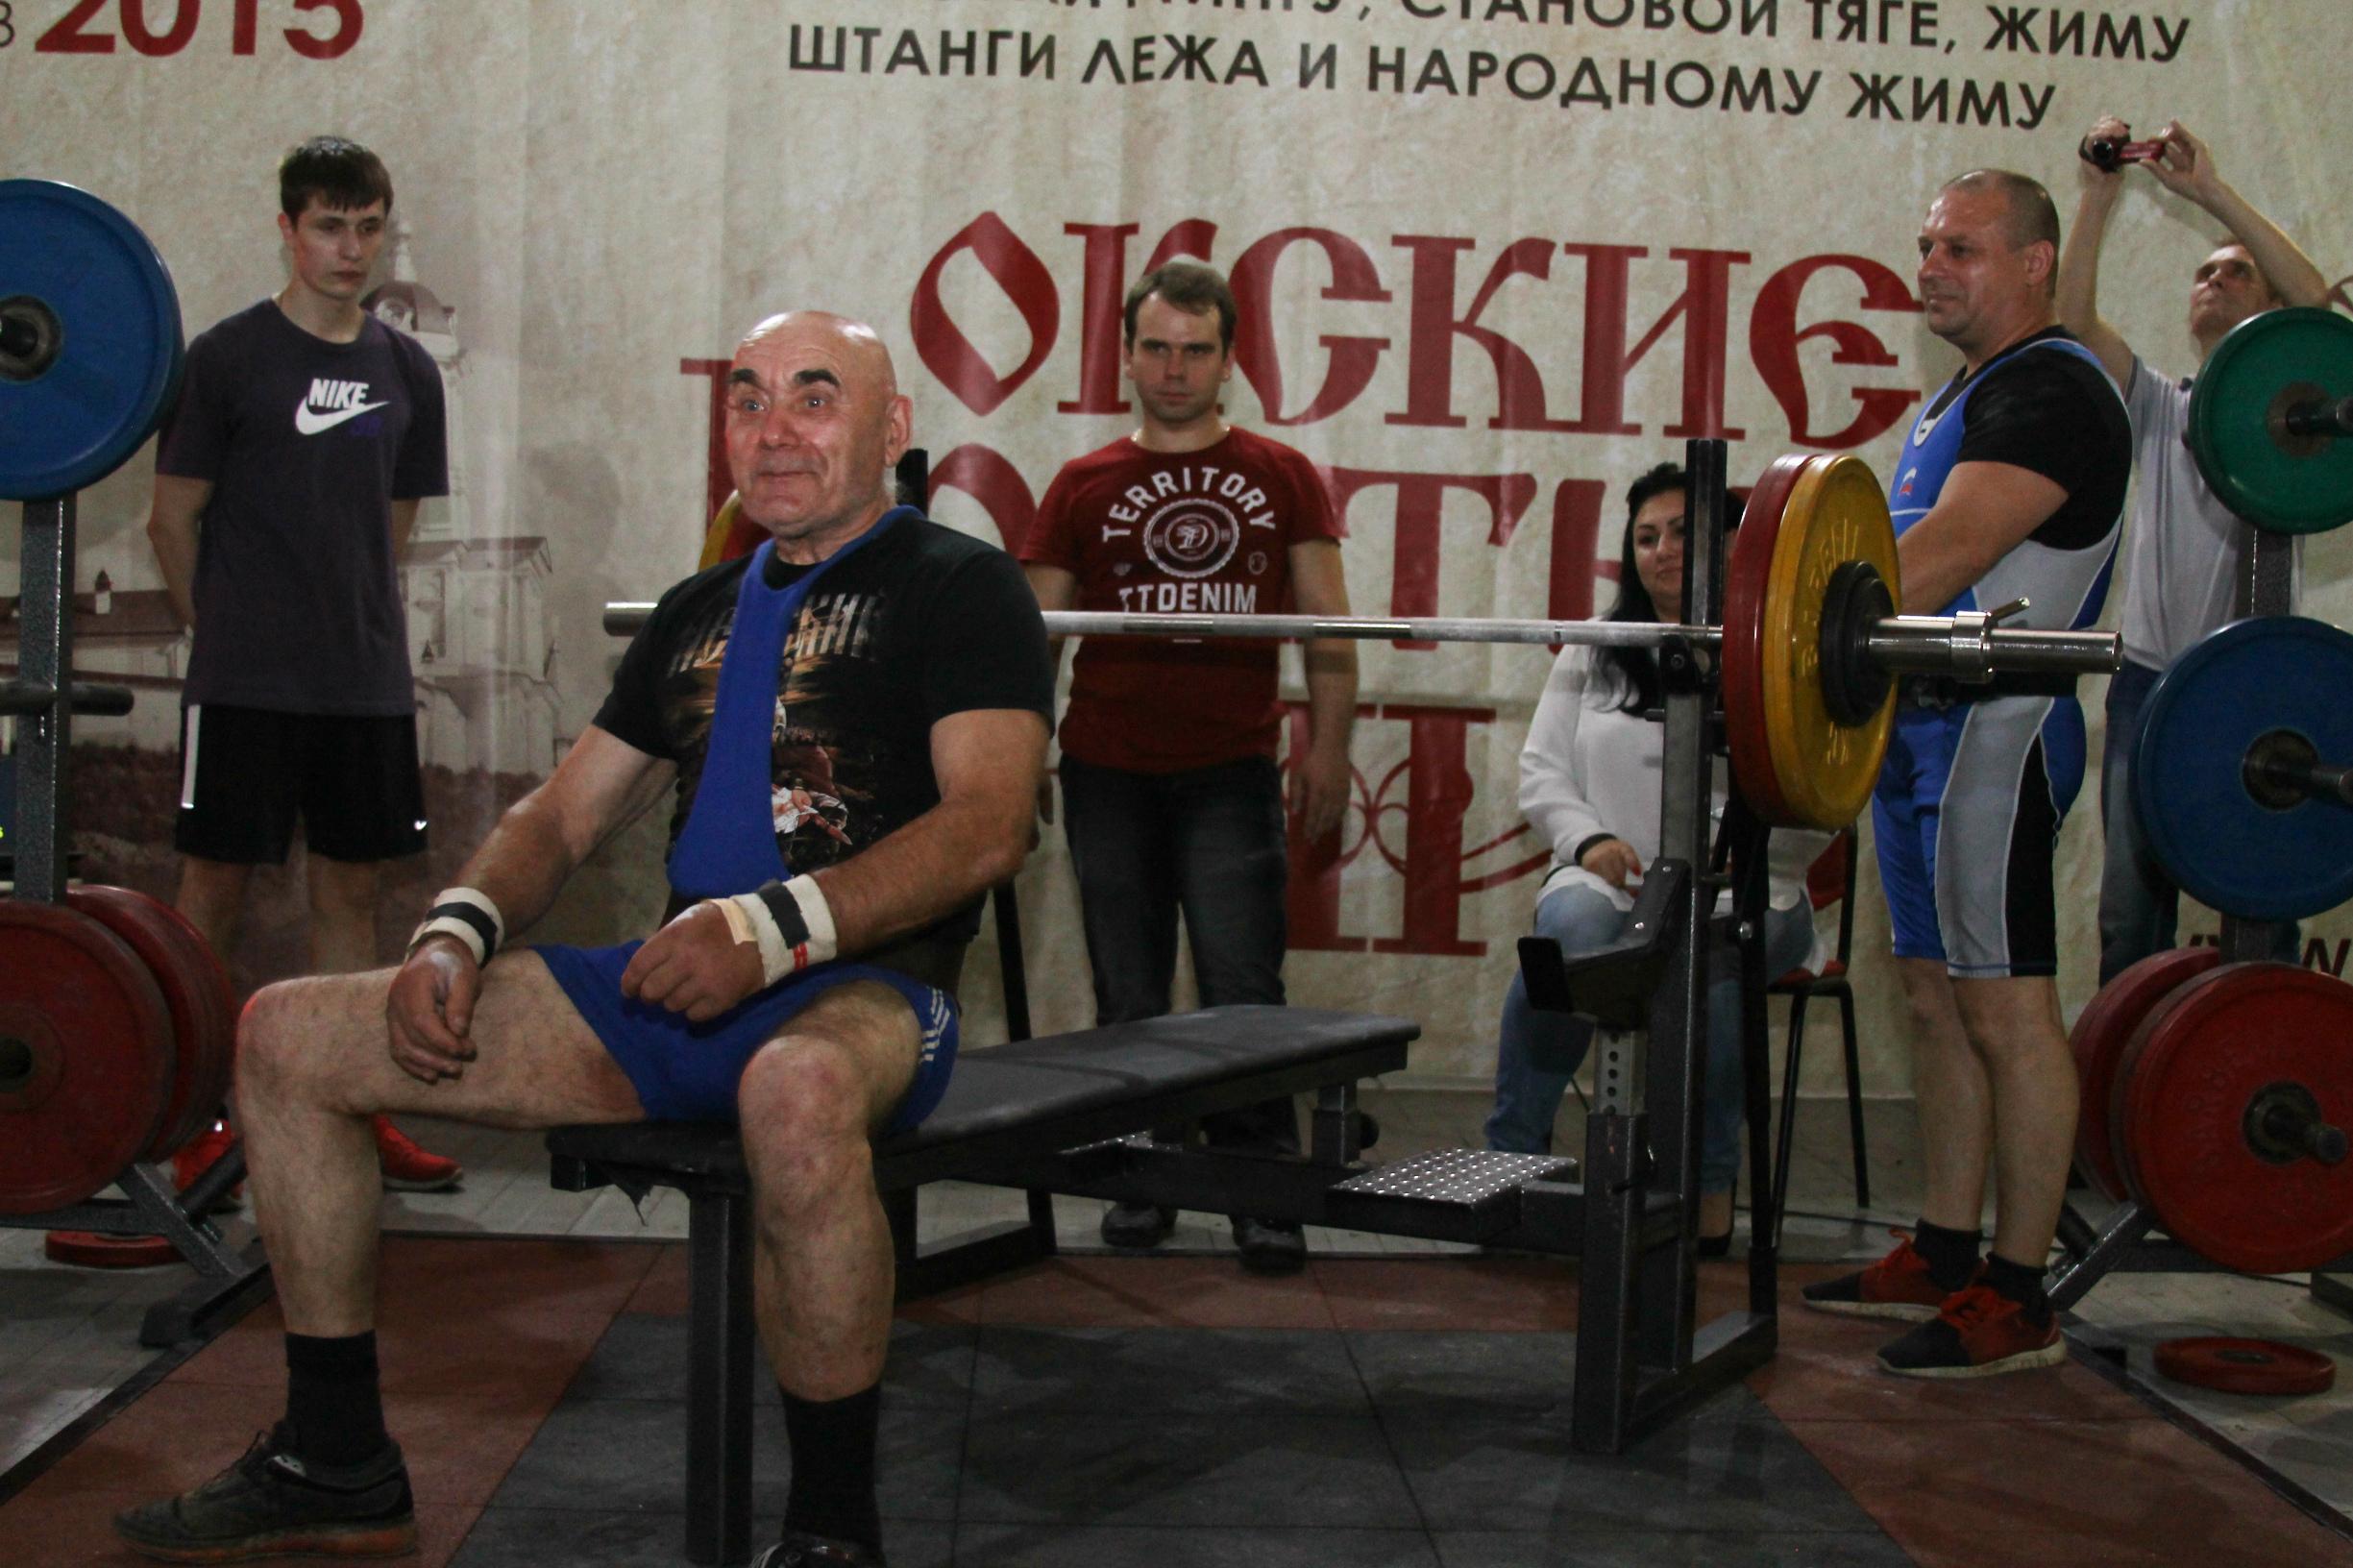 Русские девочки дрочат член ножками 14 фотография